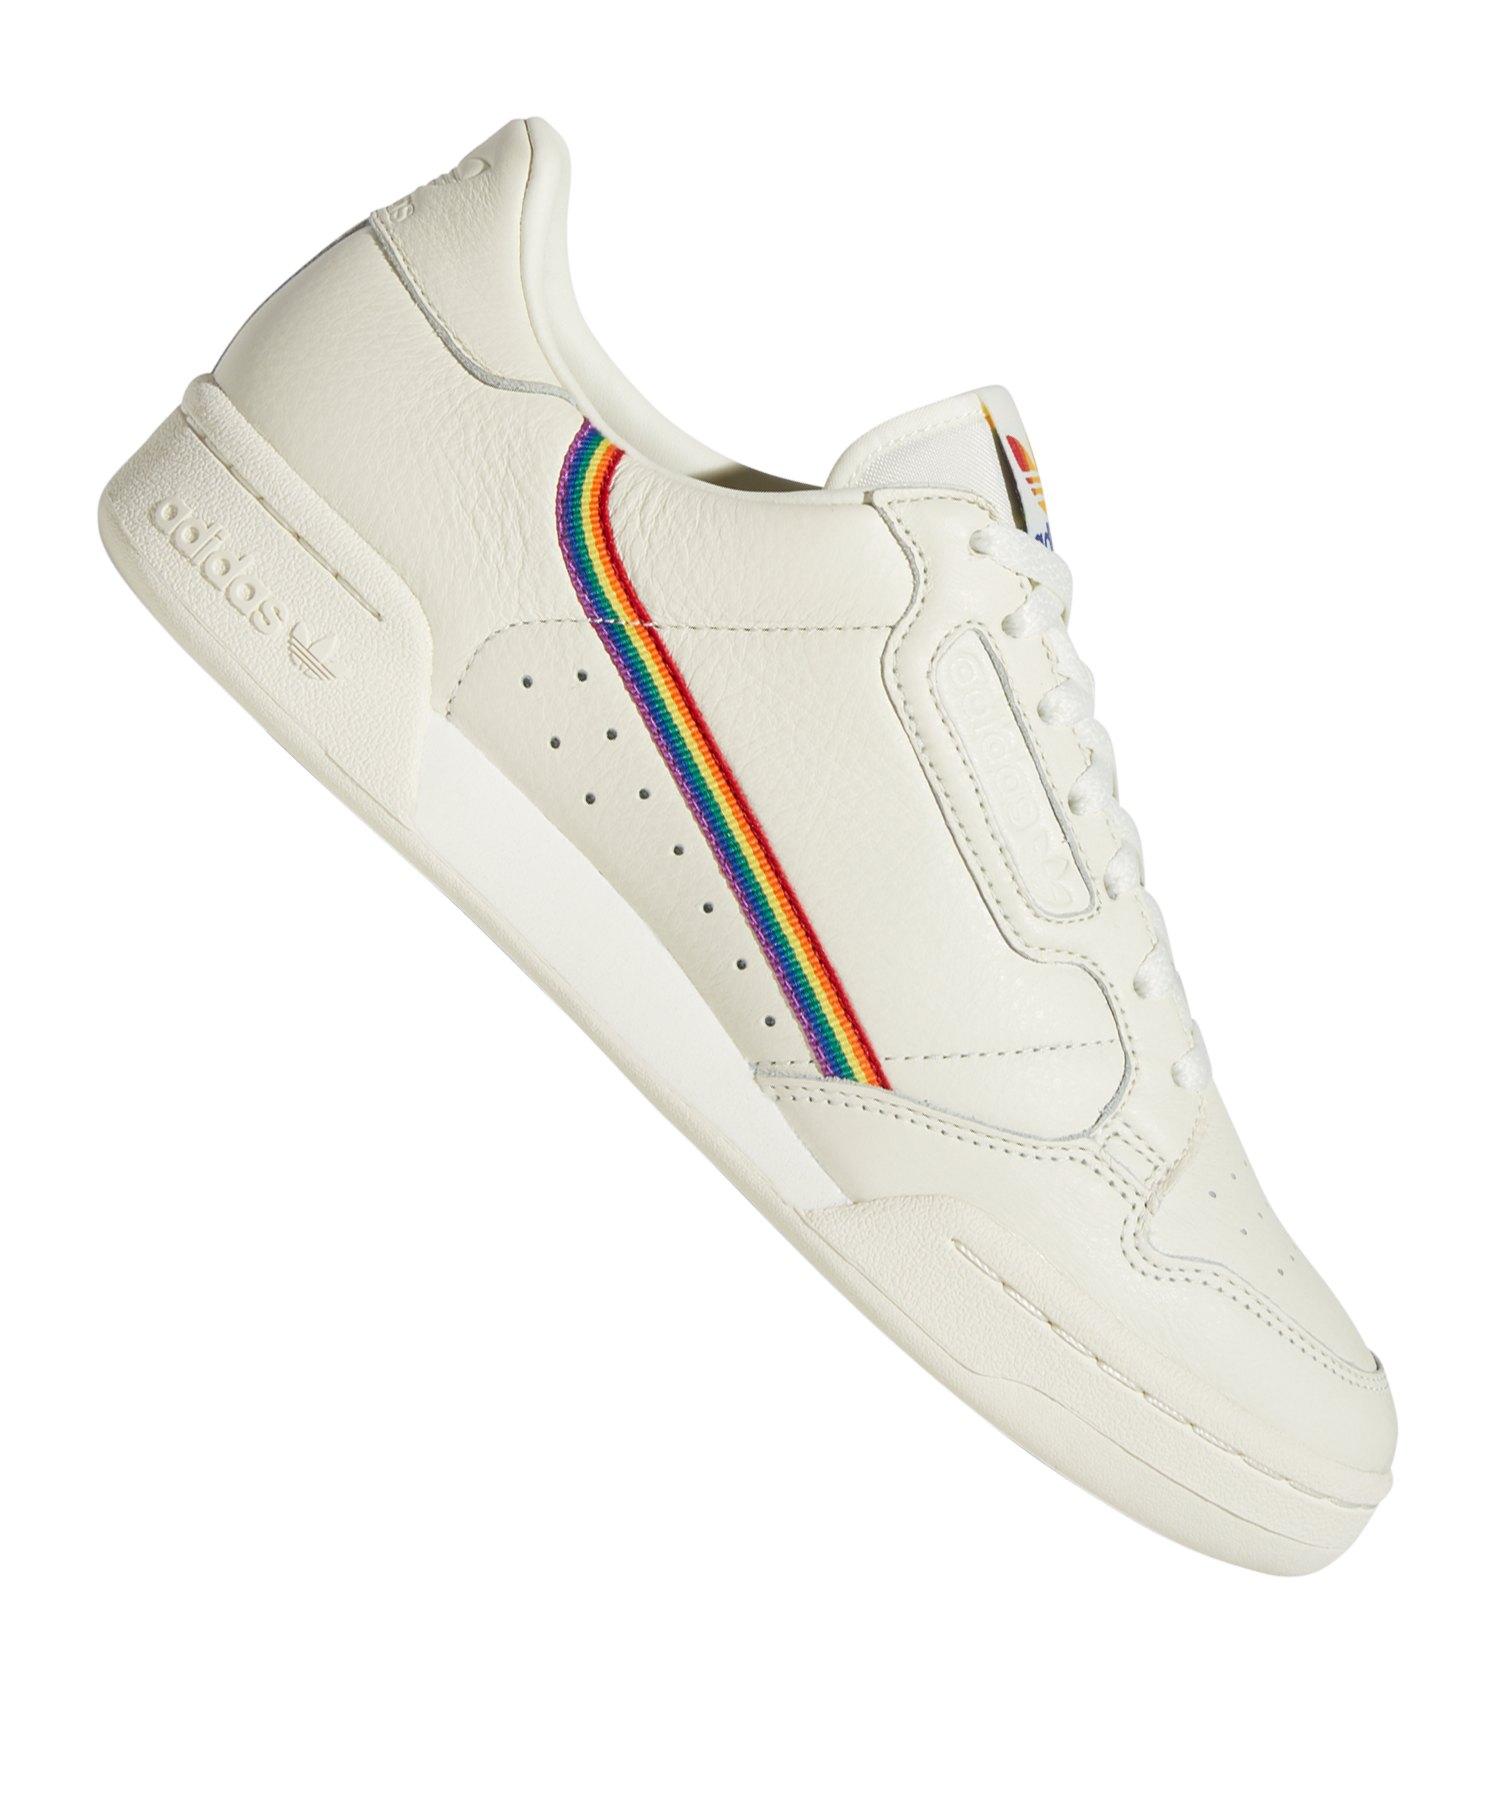 adidas Originals Continental 80 Prid Sneaker Weiss